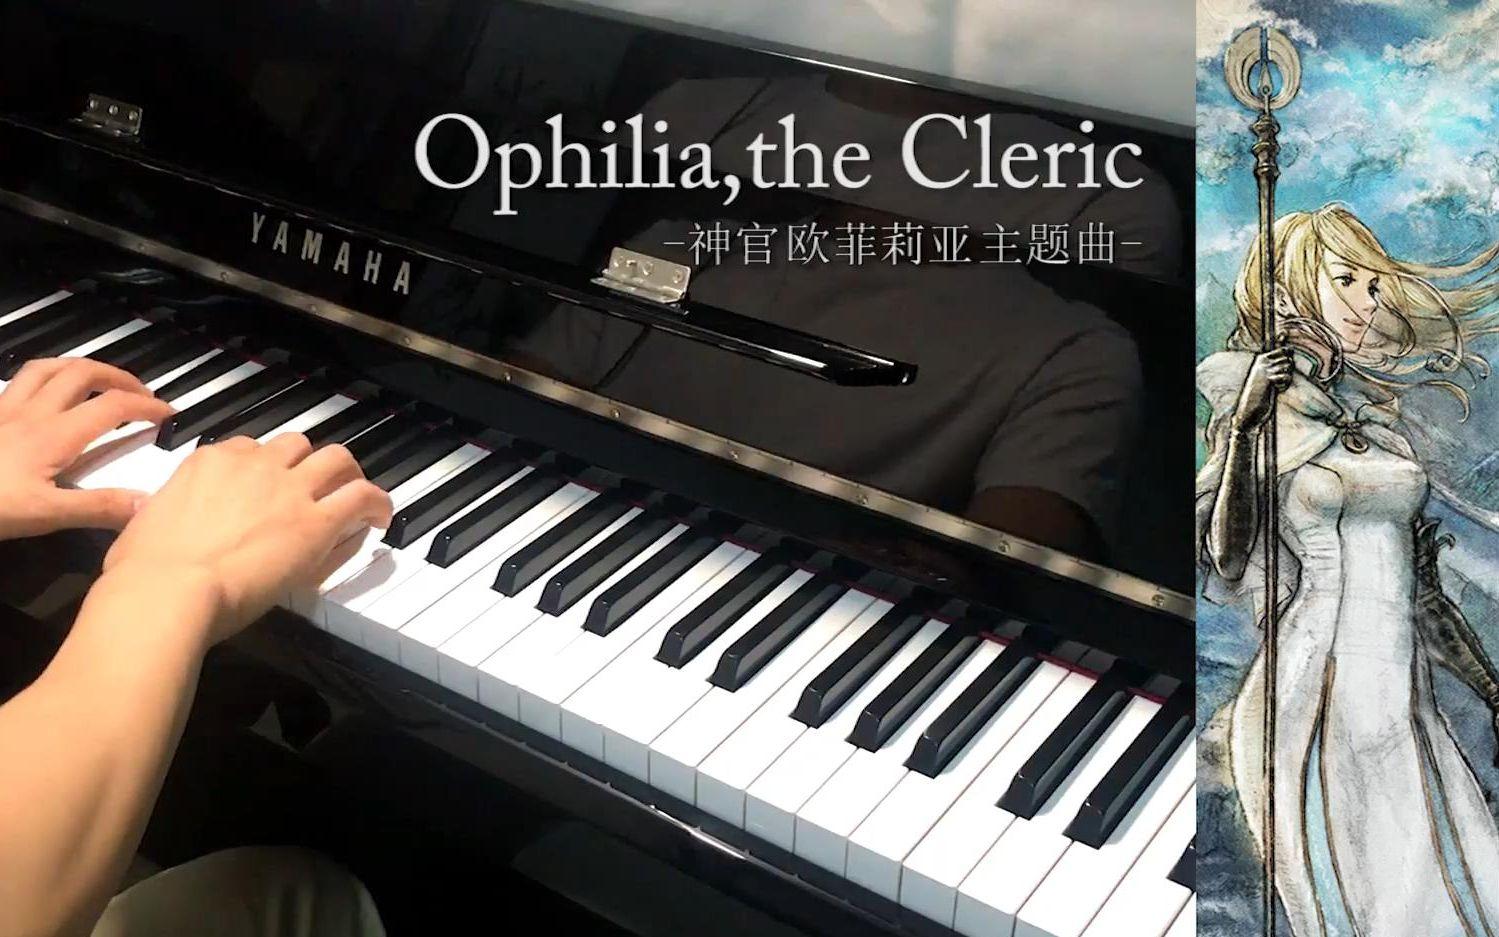 【鋼琴×八方旅人】神官-歐菲莉亞主題曲 琥珀琴師Louis演奏_嗶哩嗶哩 (゜-゜)つロ 干杯~-bilibili